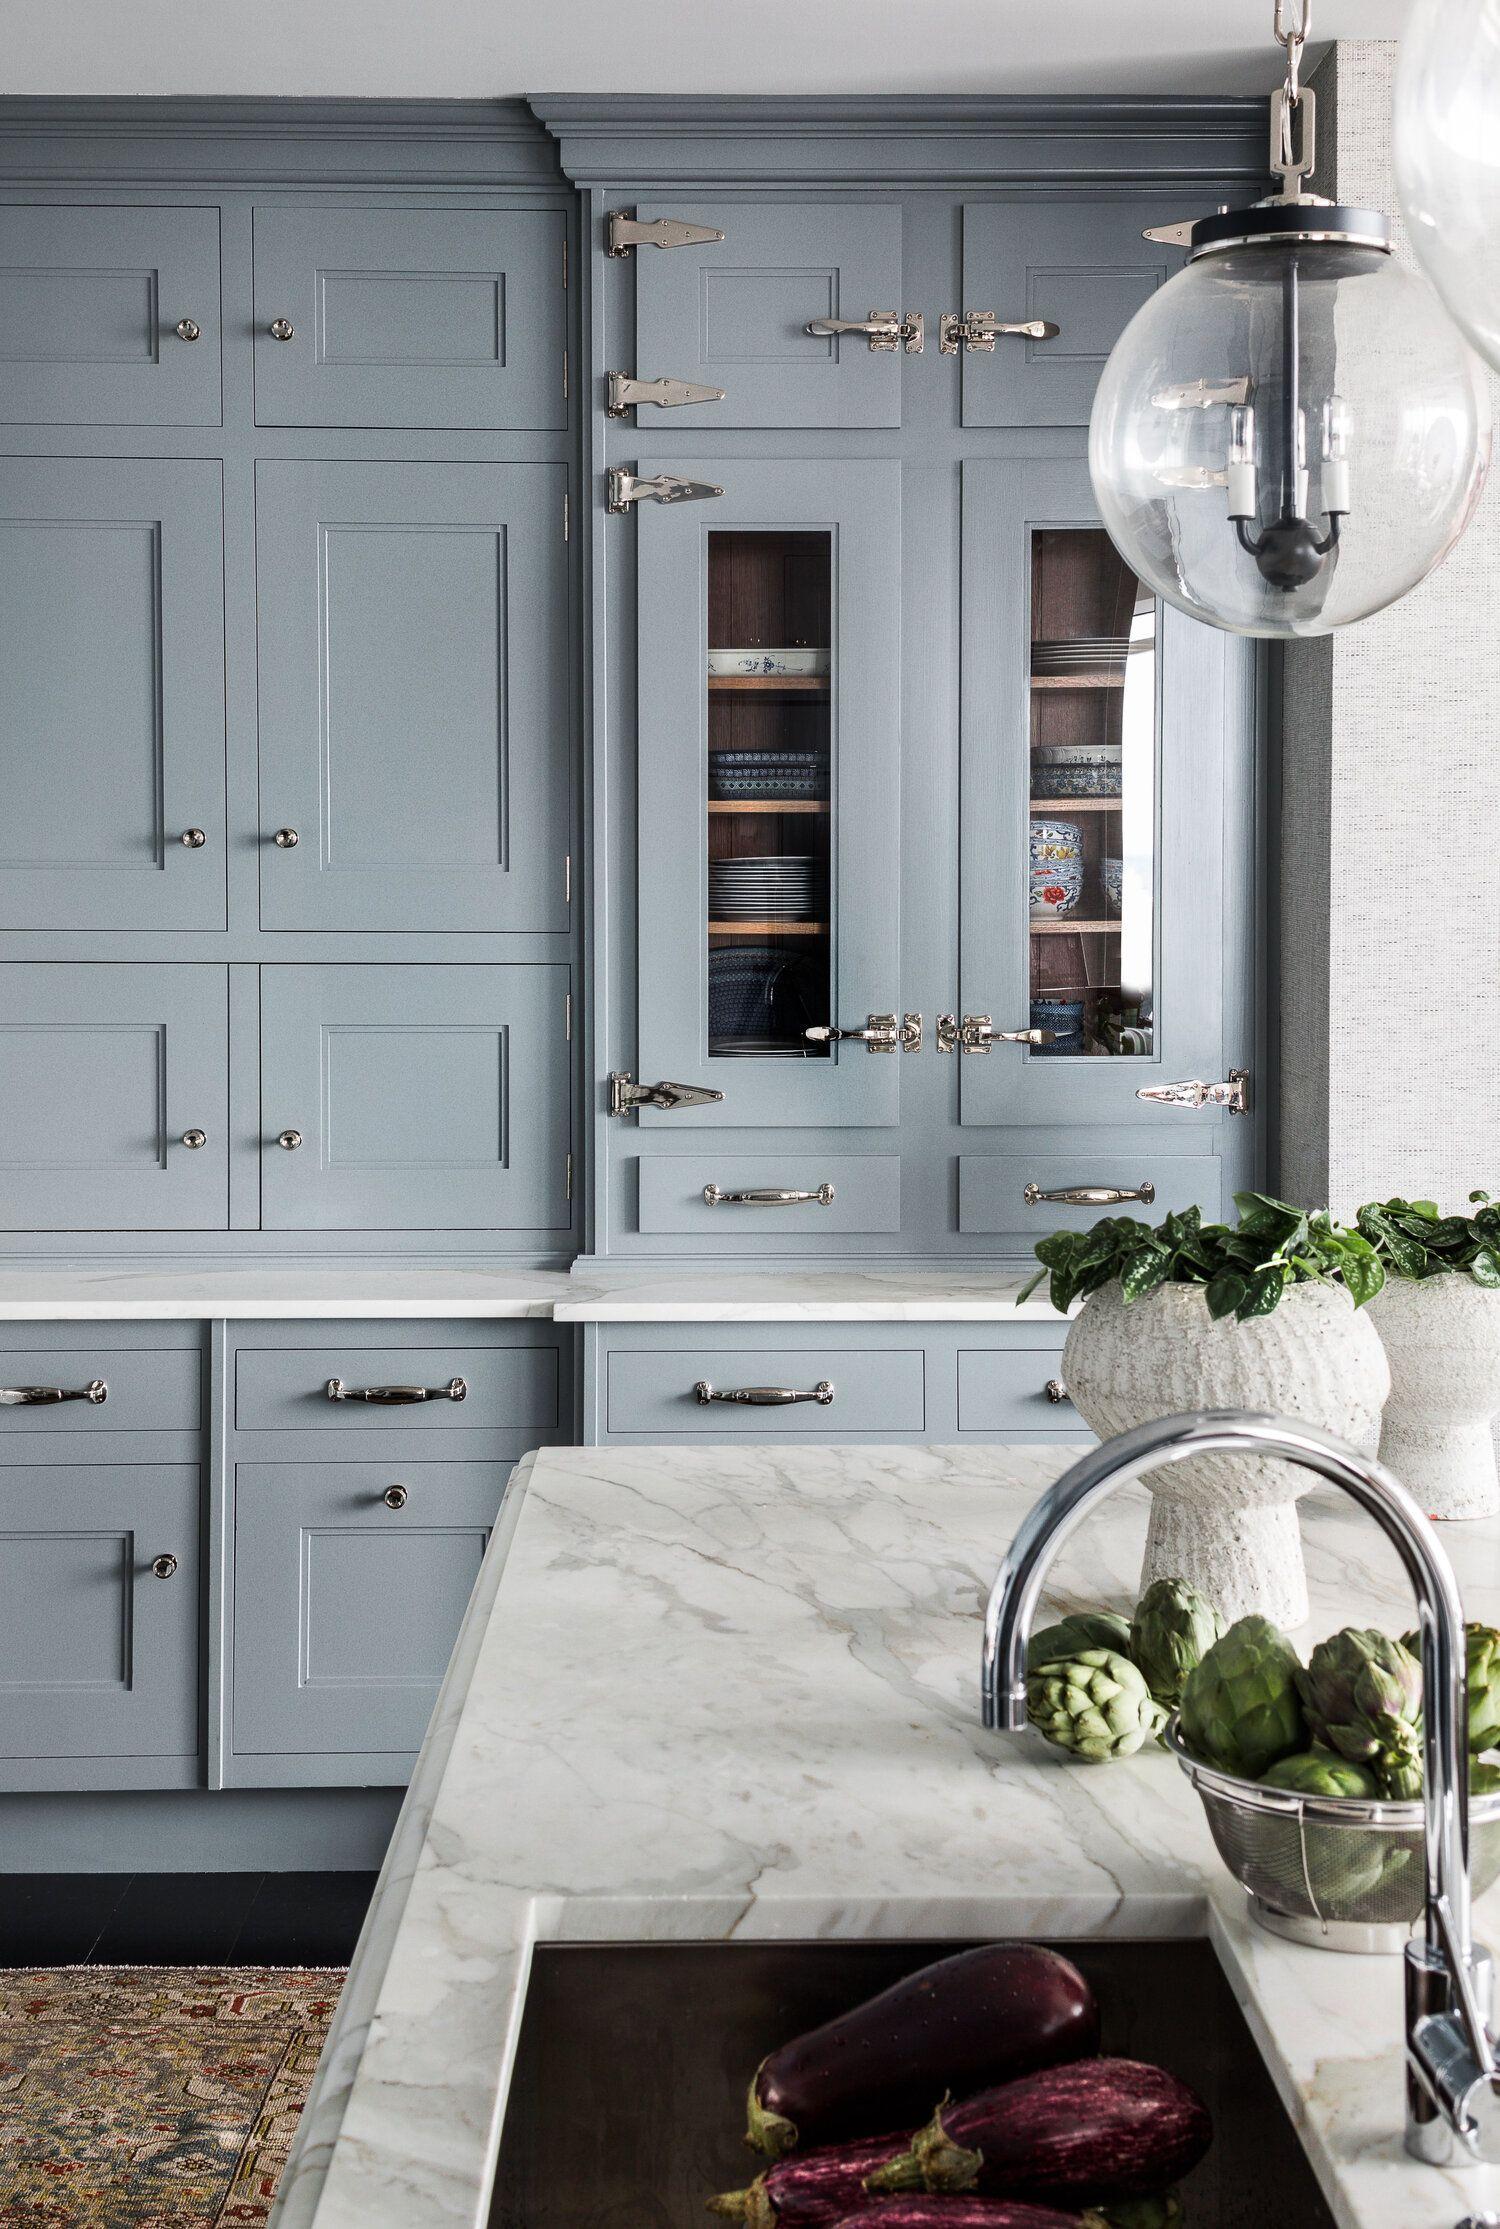 Downtown Boston Massachusetts Katie Rosenfeld Company In 2020 Modern Kitchen Cabinet Design Kitchen Cabinet Design Kitchen Cabinet Remodel